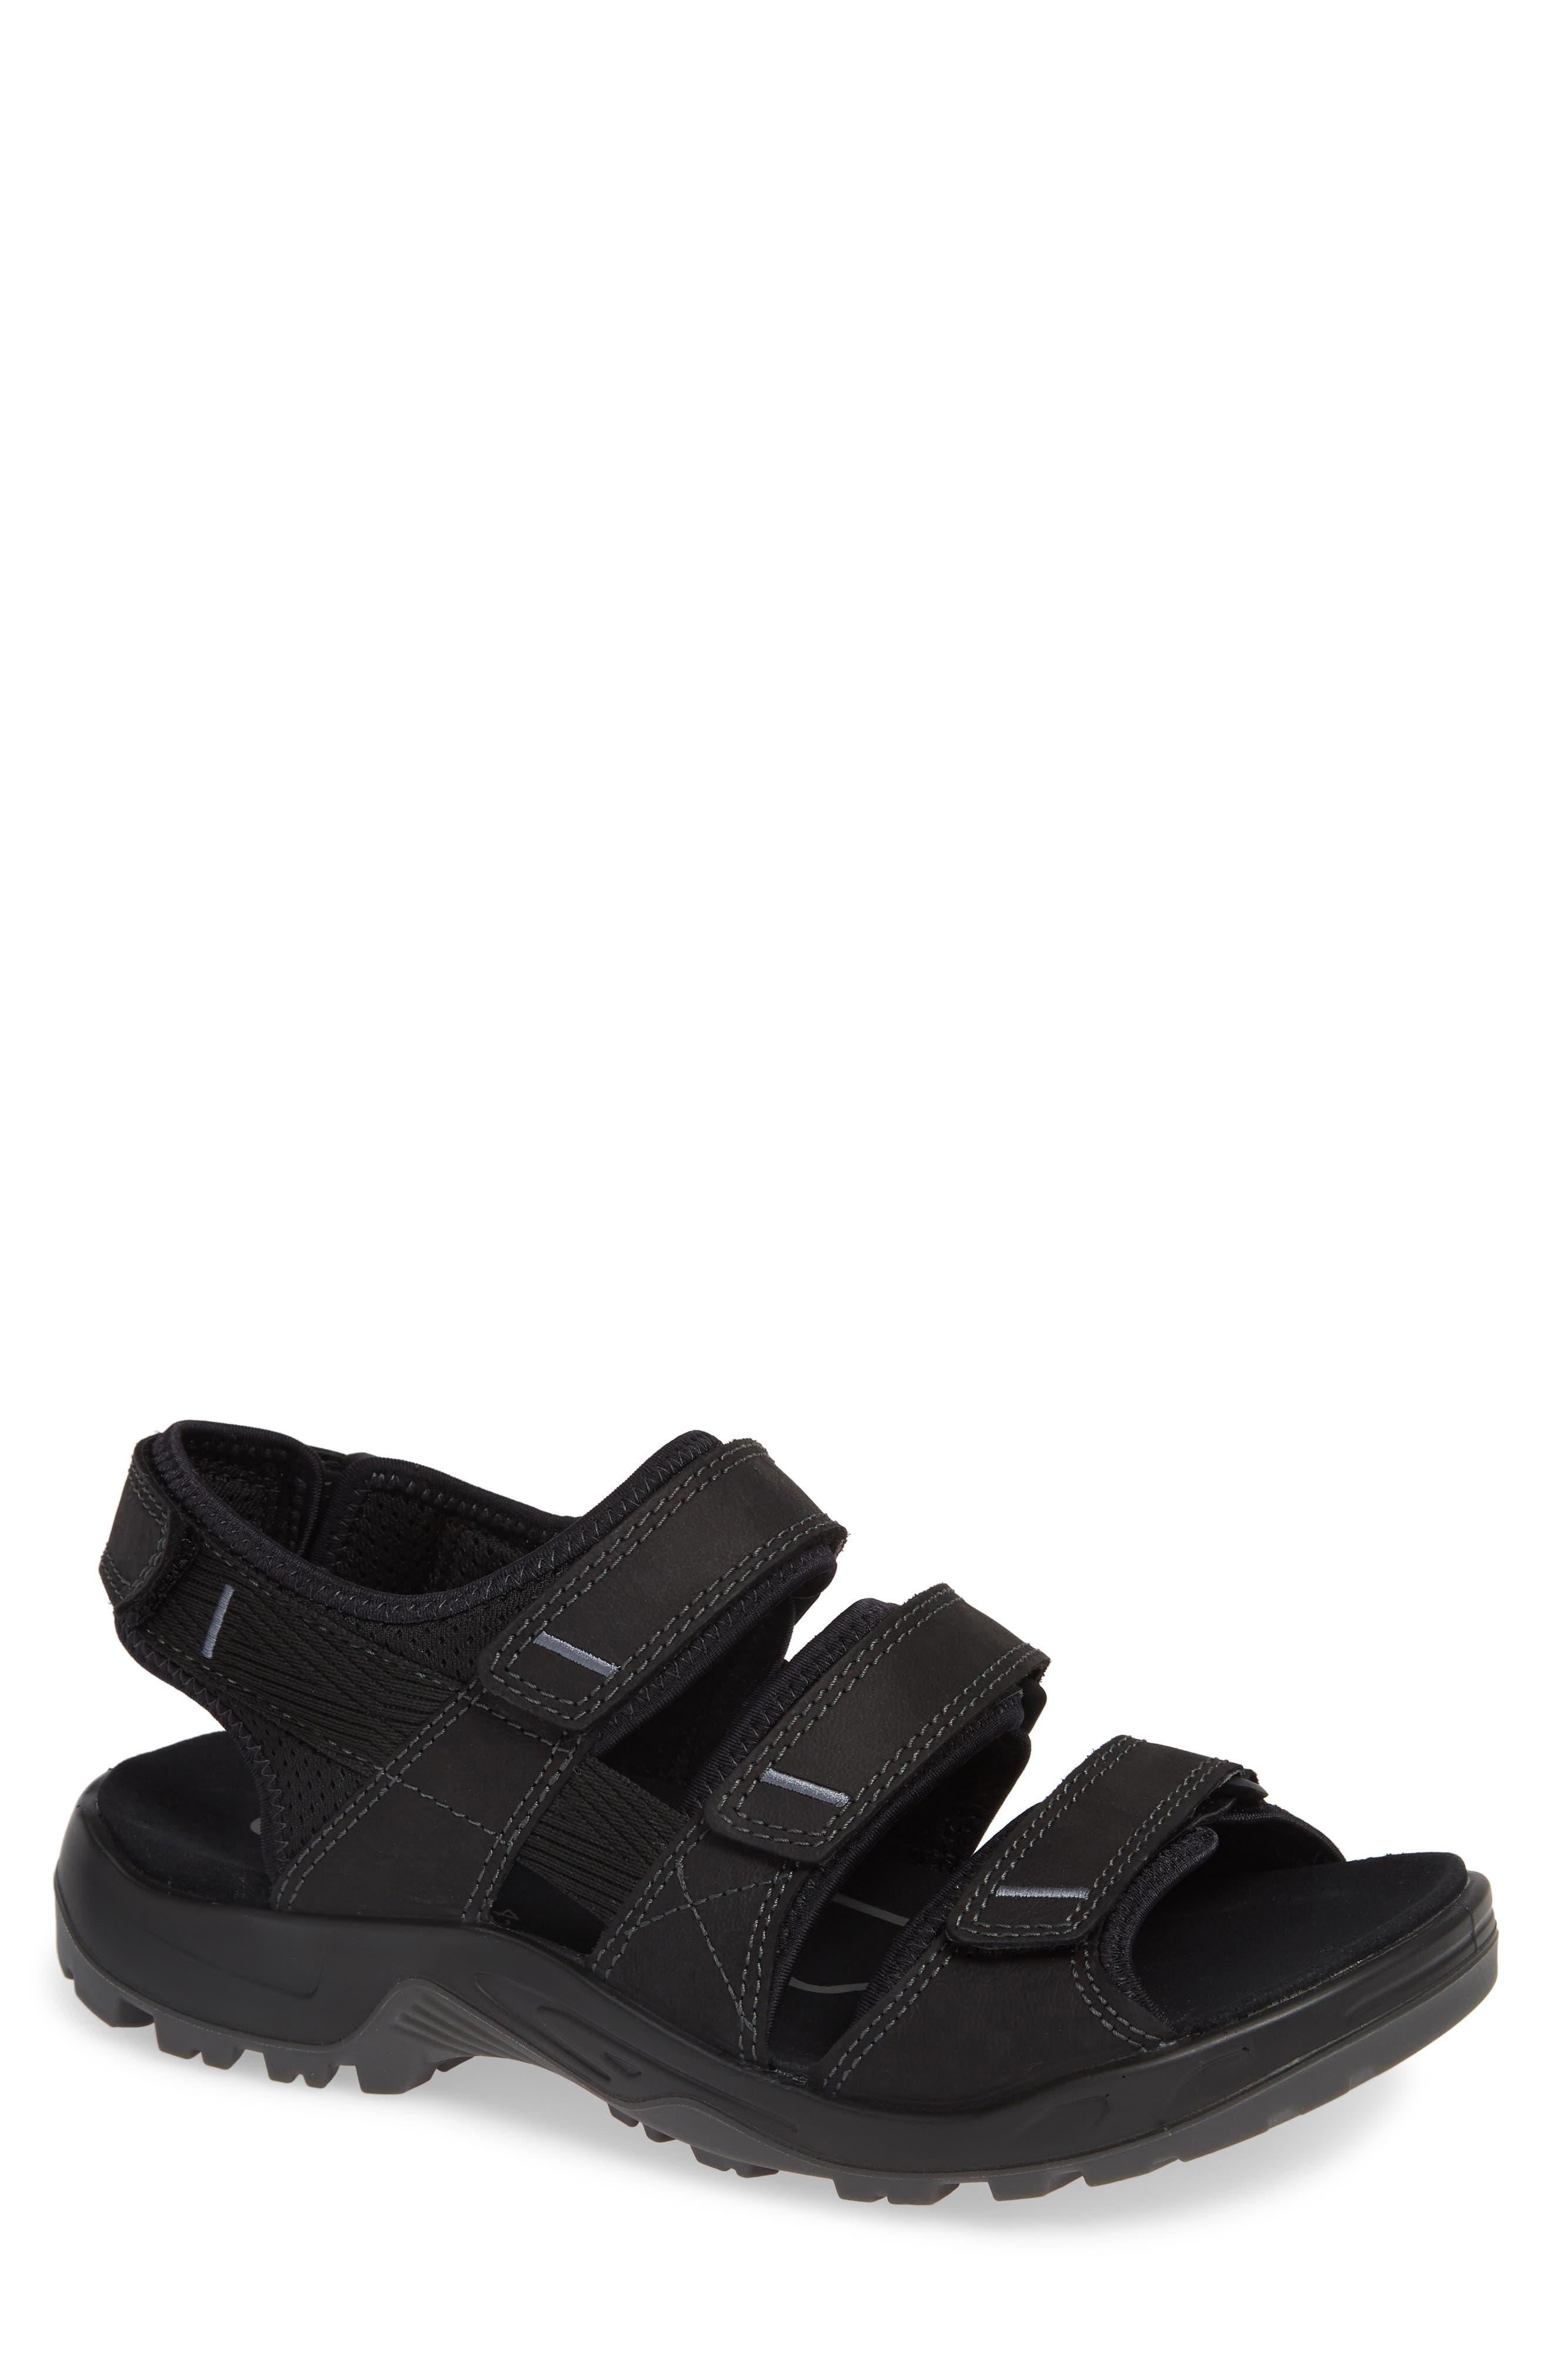 Ecco Offroad Sandal,12.5 - Black